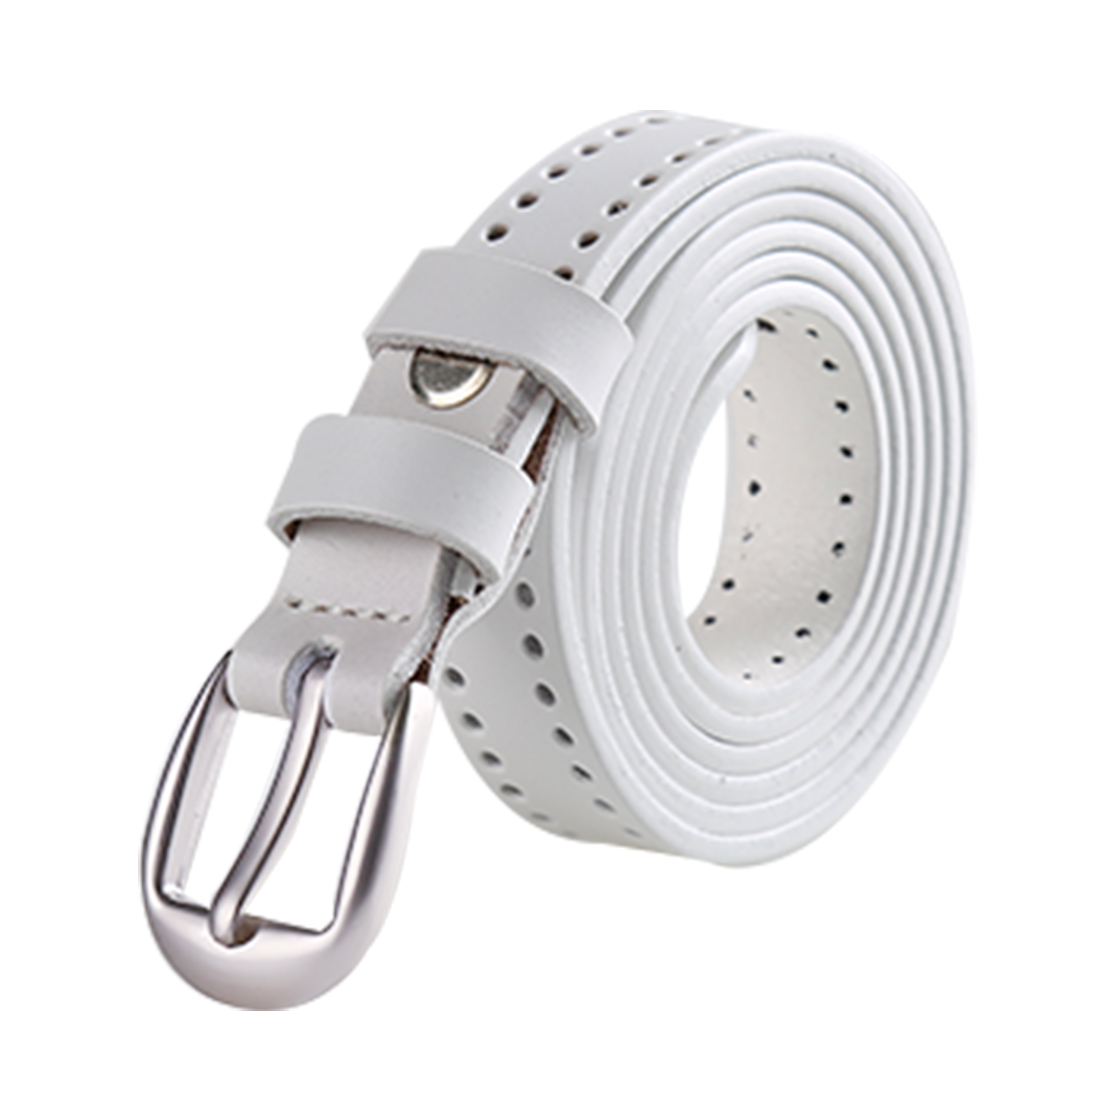 "Women Fashion Thin Single Pin Buckle Belt Width 3/4"" White 115CM - image 5 of 5"